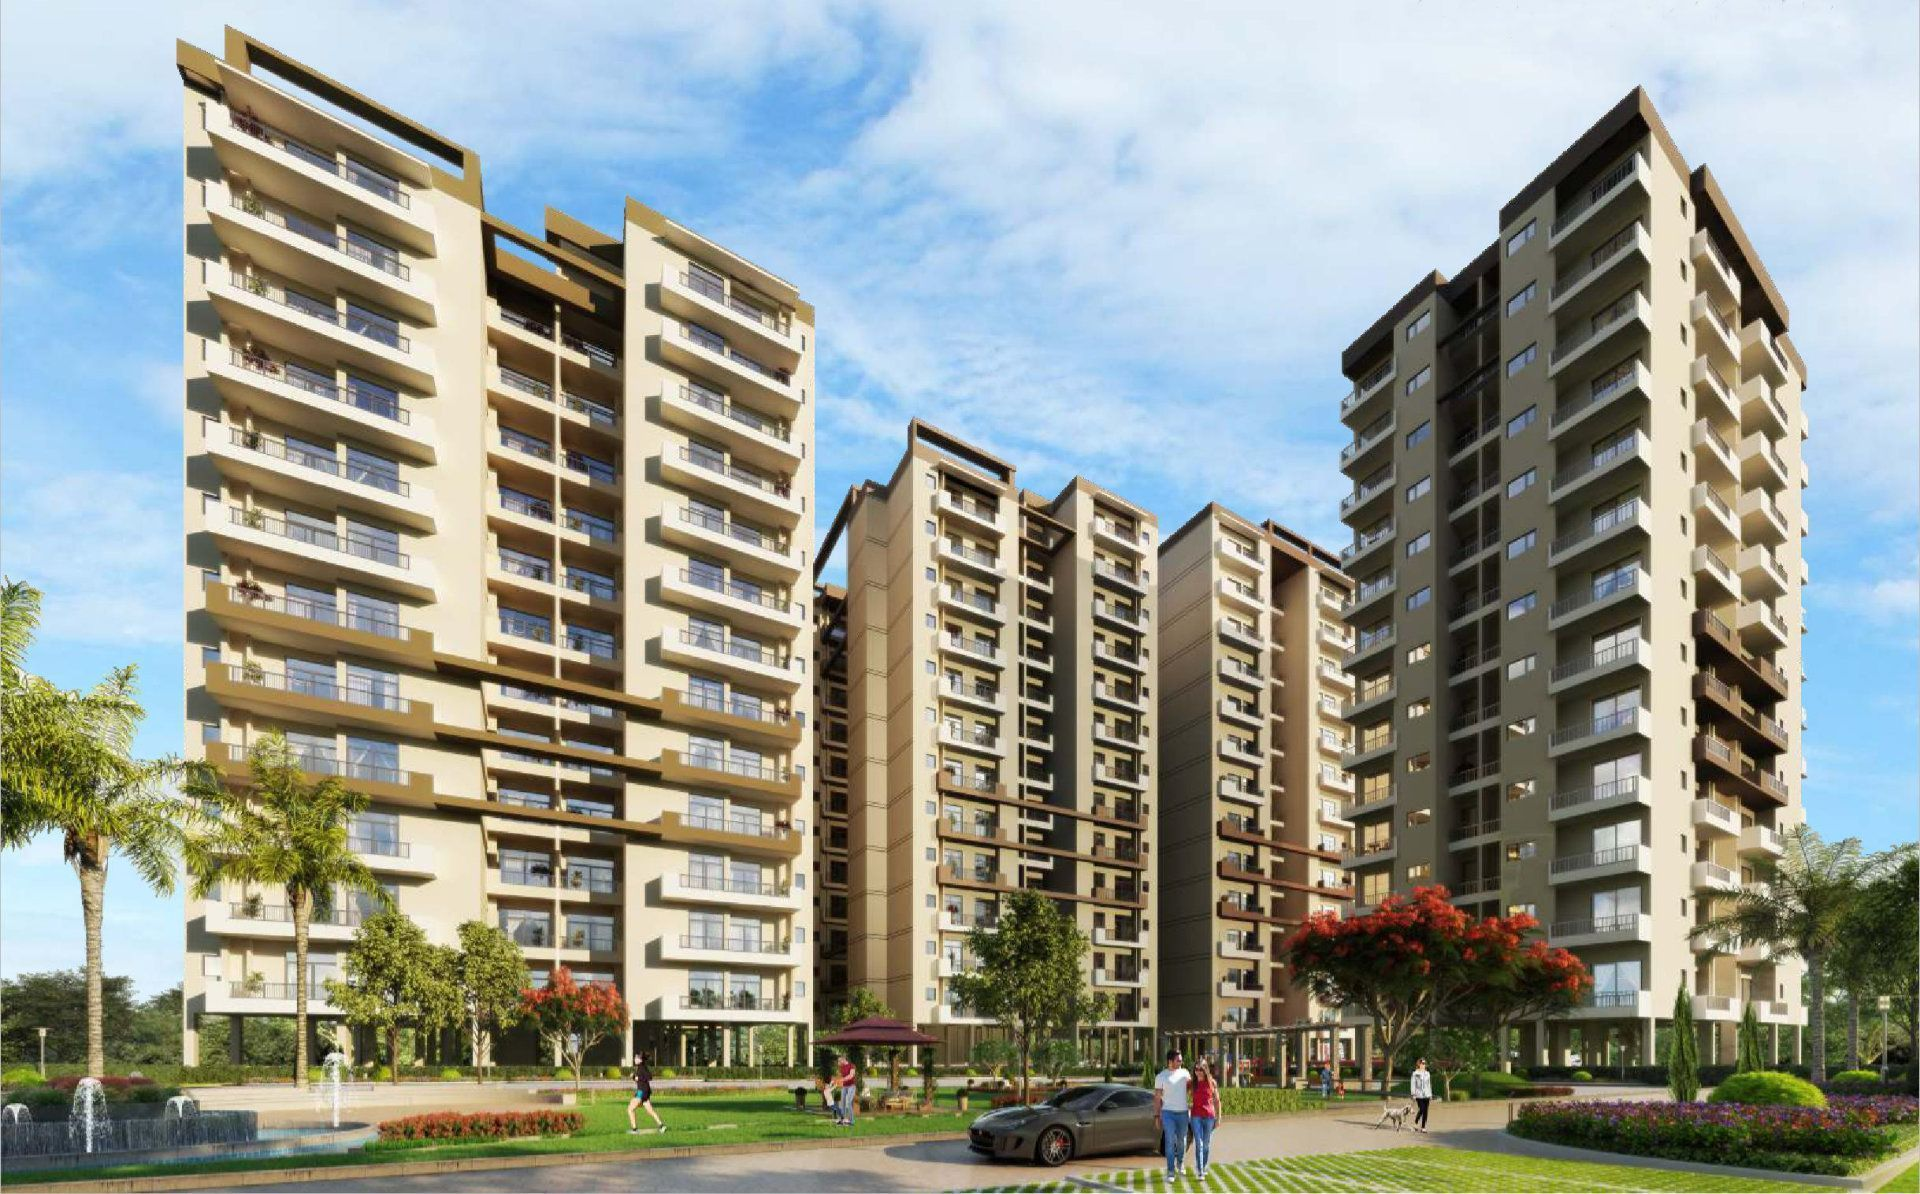 2-3-4bhk premium flats for sale in uptown skylla zirakpur